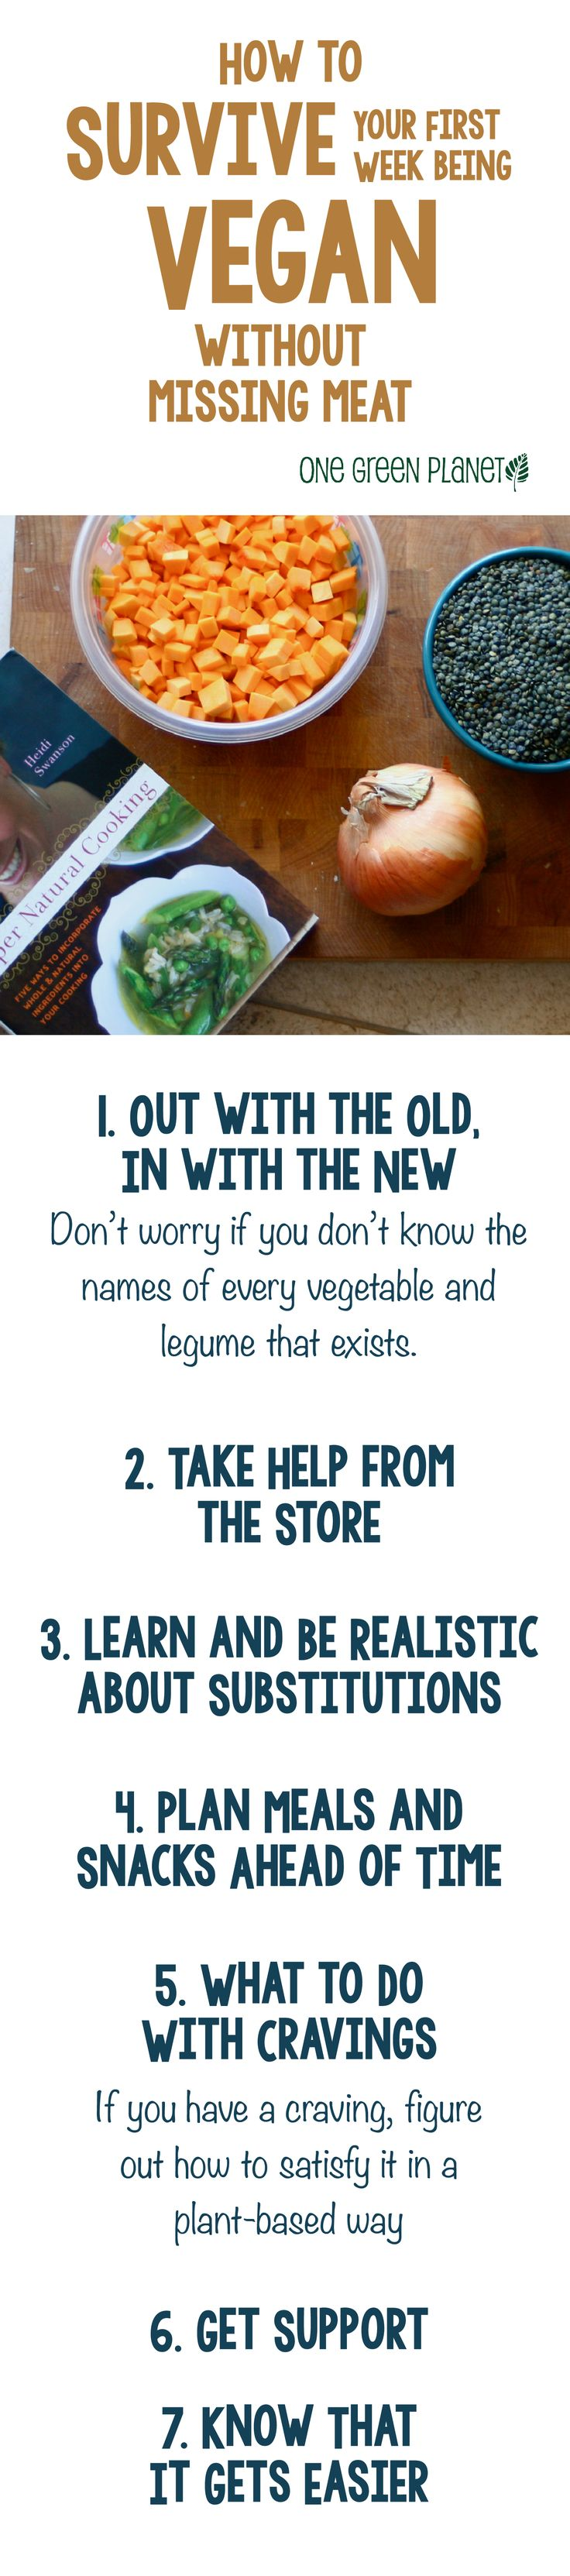 http://onegr.pl/1AZmiVh #vegan #vegetarian #health #tips #howto #diet